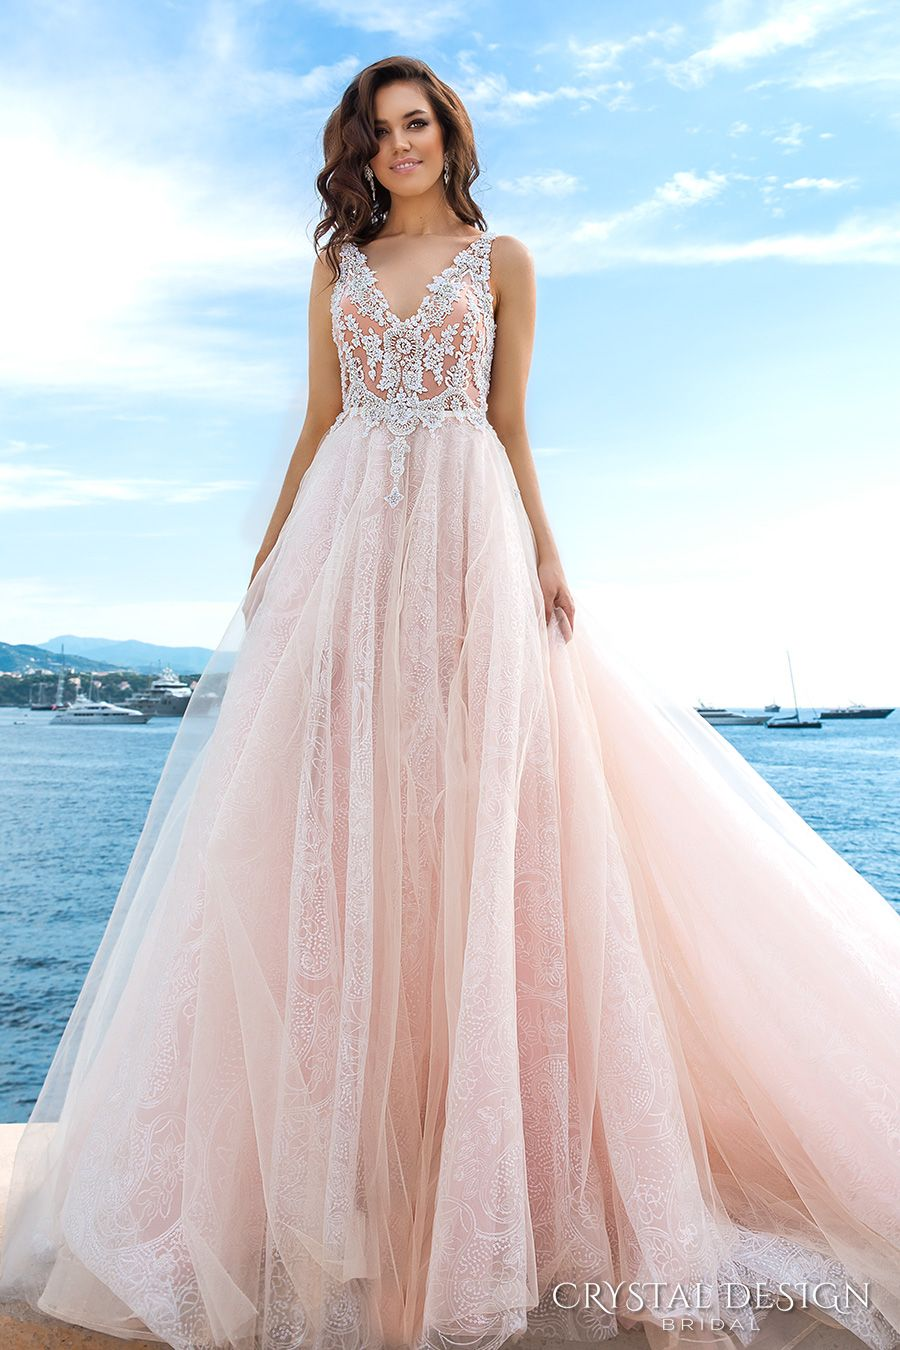 Crystal Design 2017 Wedding Dresses Haute Couture Bridal Collection Wedding Inspirasi Lace Wedding Dress Vintage Blush Pink Wedding Dress Bridal Gowns Vintage [ 1350 x 900 Pixel ]